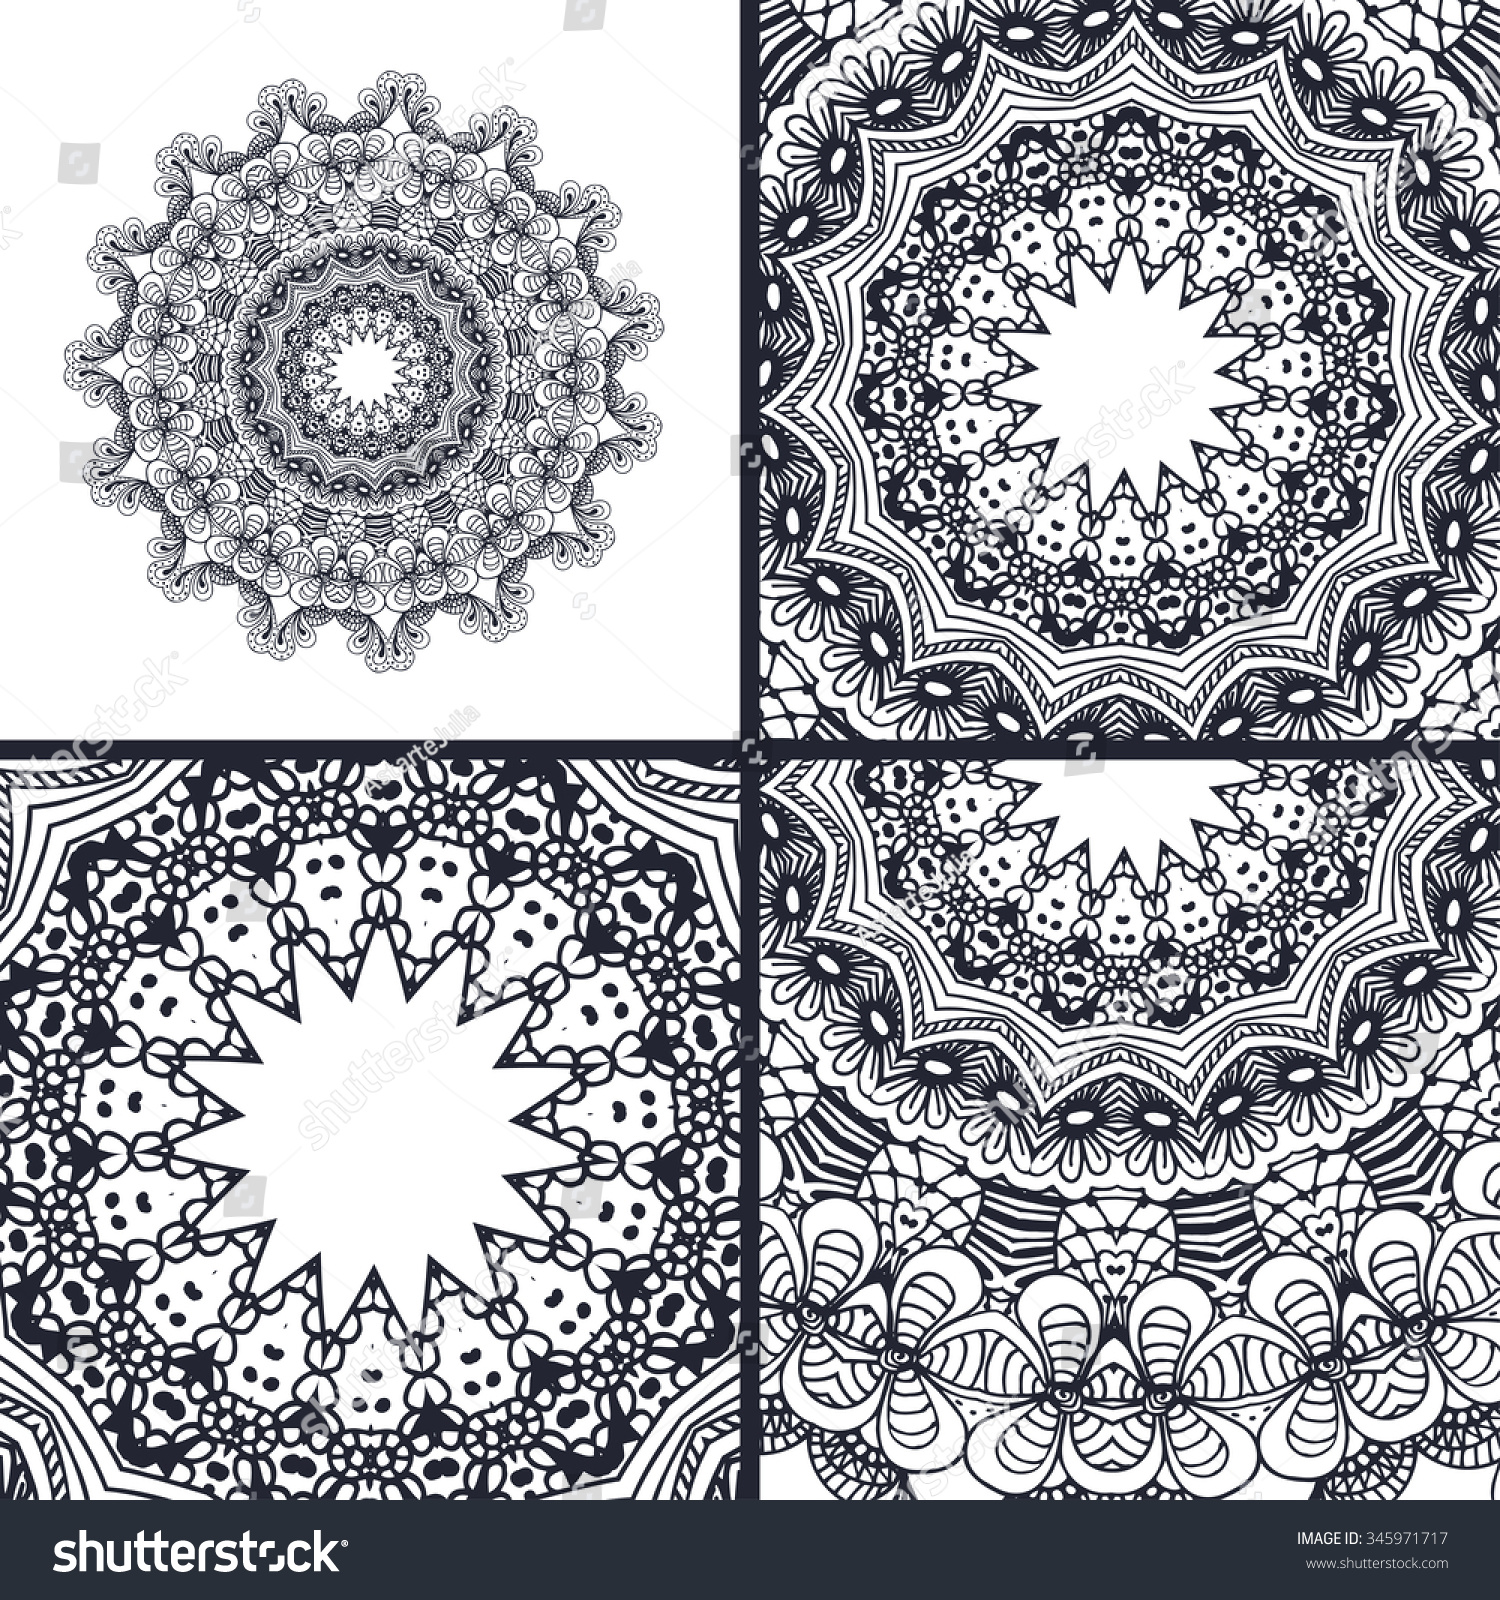 Vector Abstract Coloring Pages Mandala Islam Stock Vector